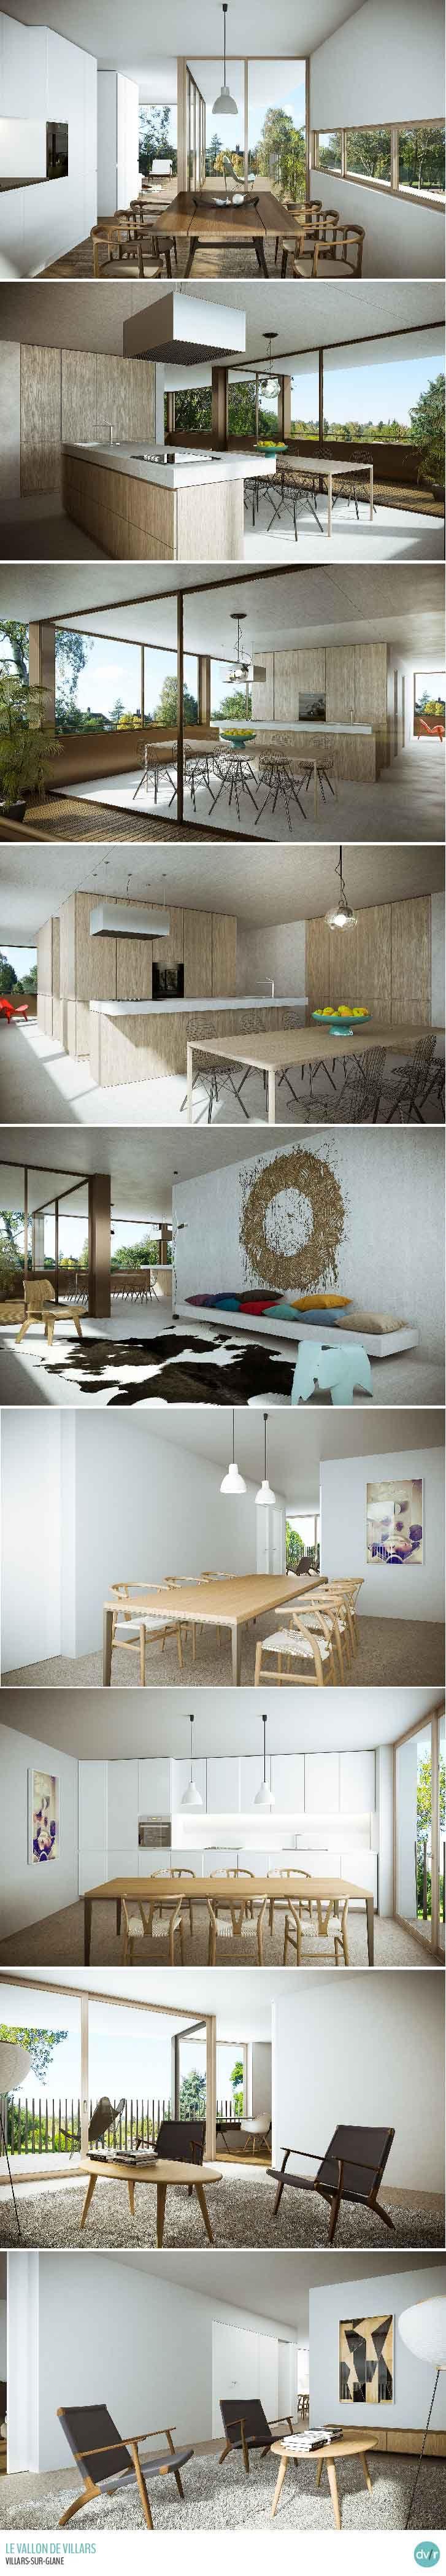 Le Vallon de Villars - Apartments - High quality Render and